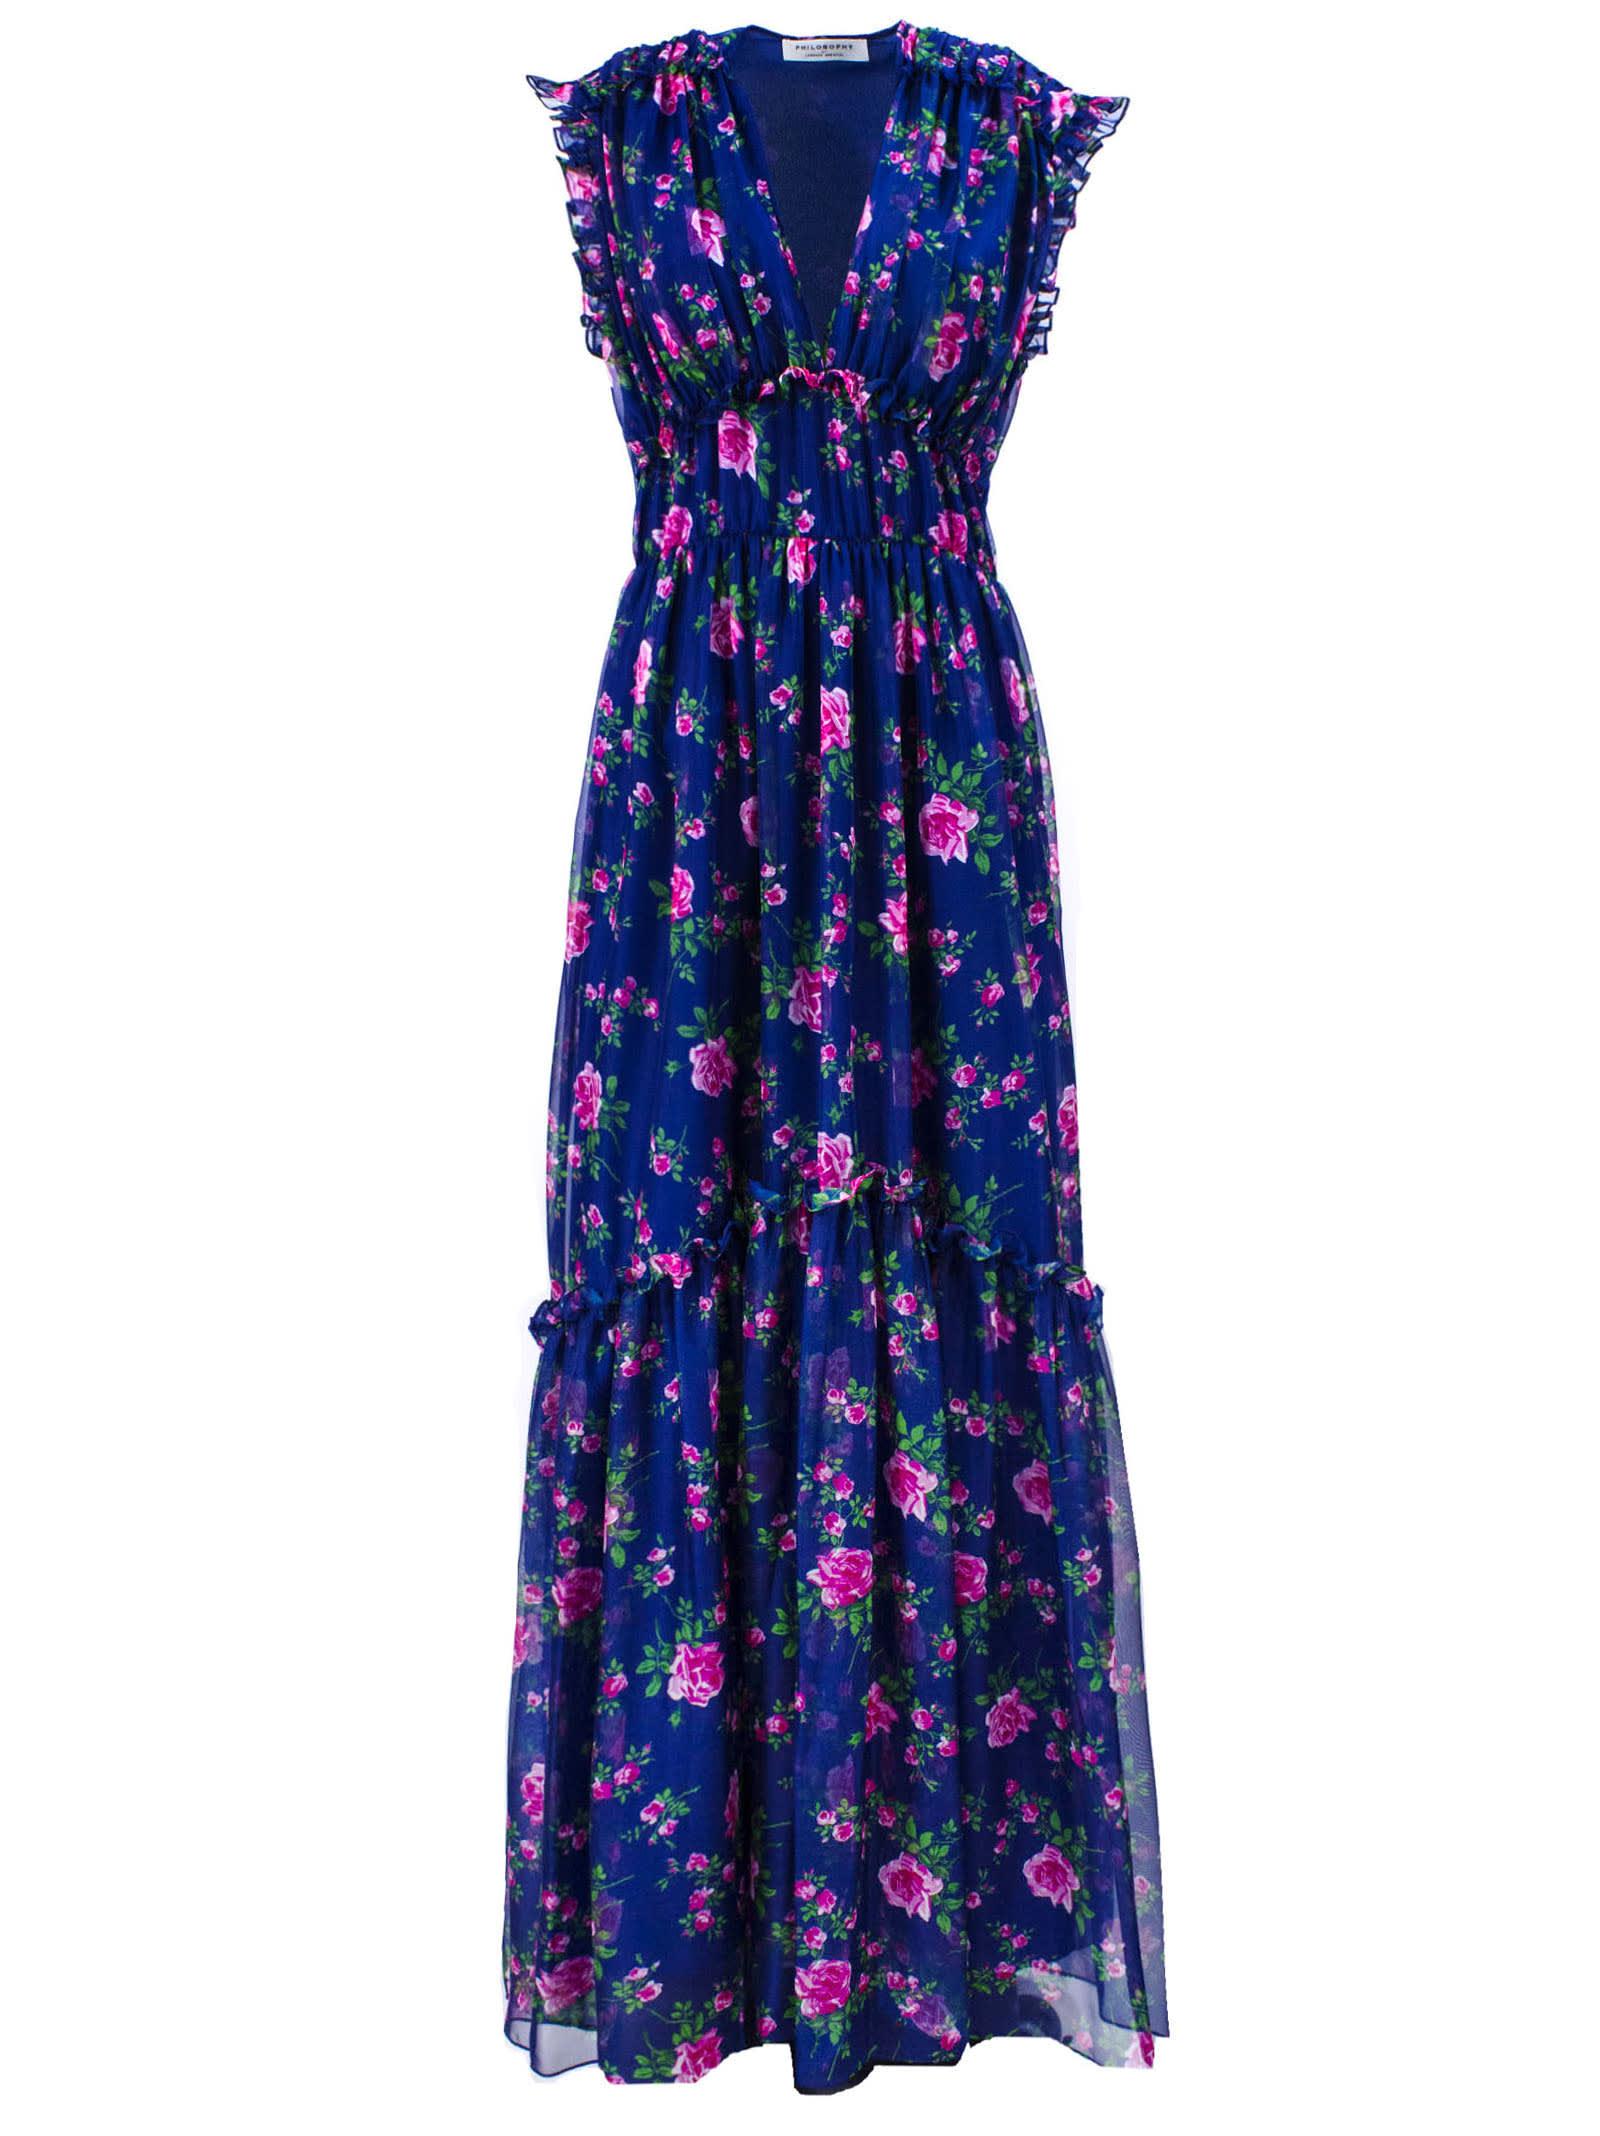 Buy Philosophy di Lorenzo Serafini Dark Blue Floral-print Maxi Dress online, shop Philosophy di Lorenzo Serafini with free shipping